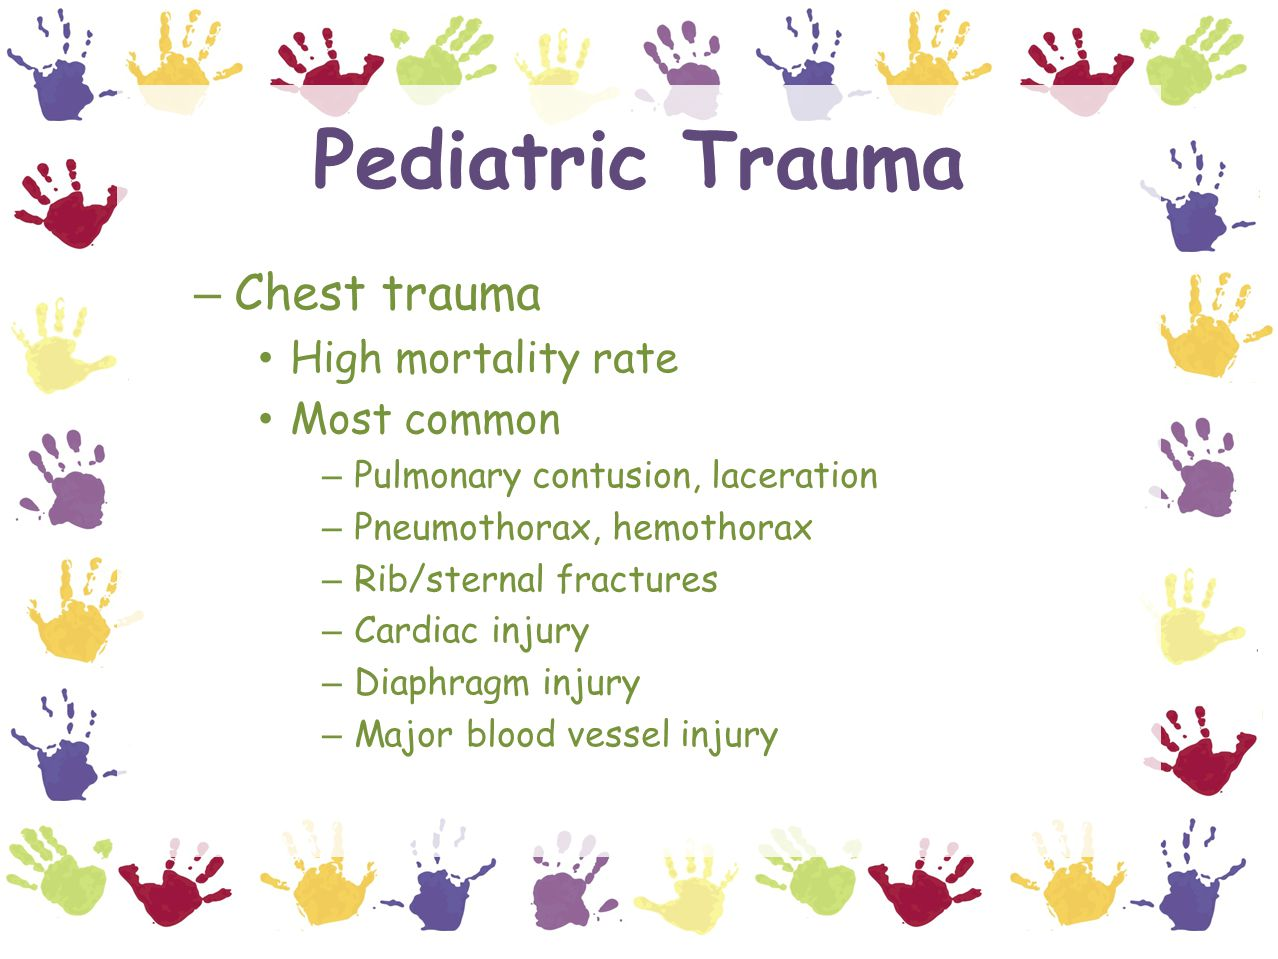 Pediatric Trauma – Chest trauma High mortality rate Most common – Pulmonary contusion, laceration – Pneumothorax, hemothorax – Rib/sternal fractures – Cardiac injury – Diaphragm injury – Major blood vessel injury